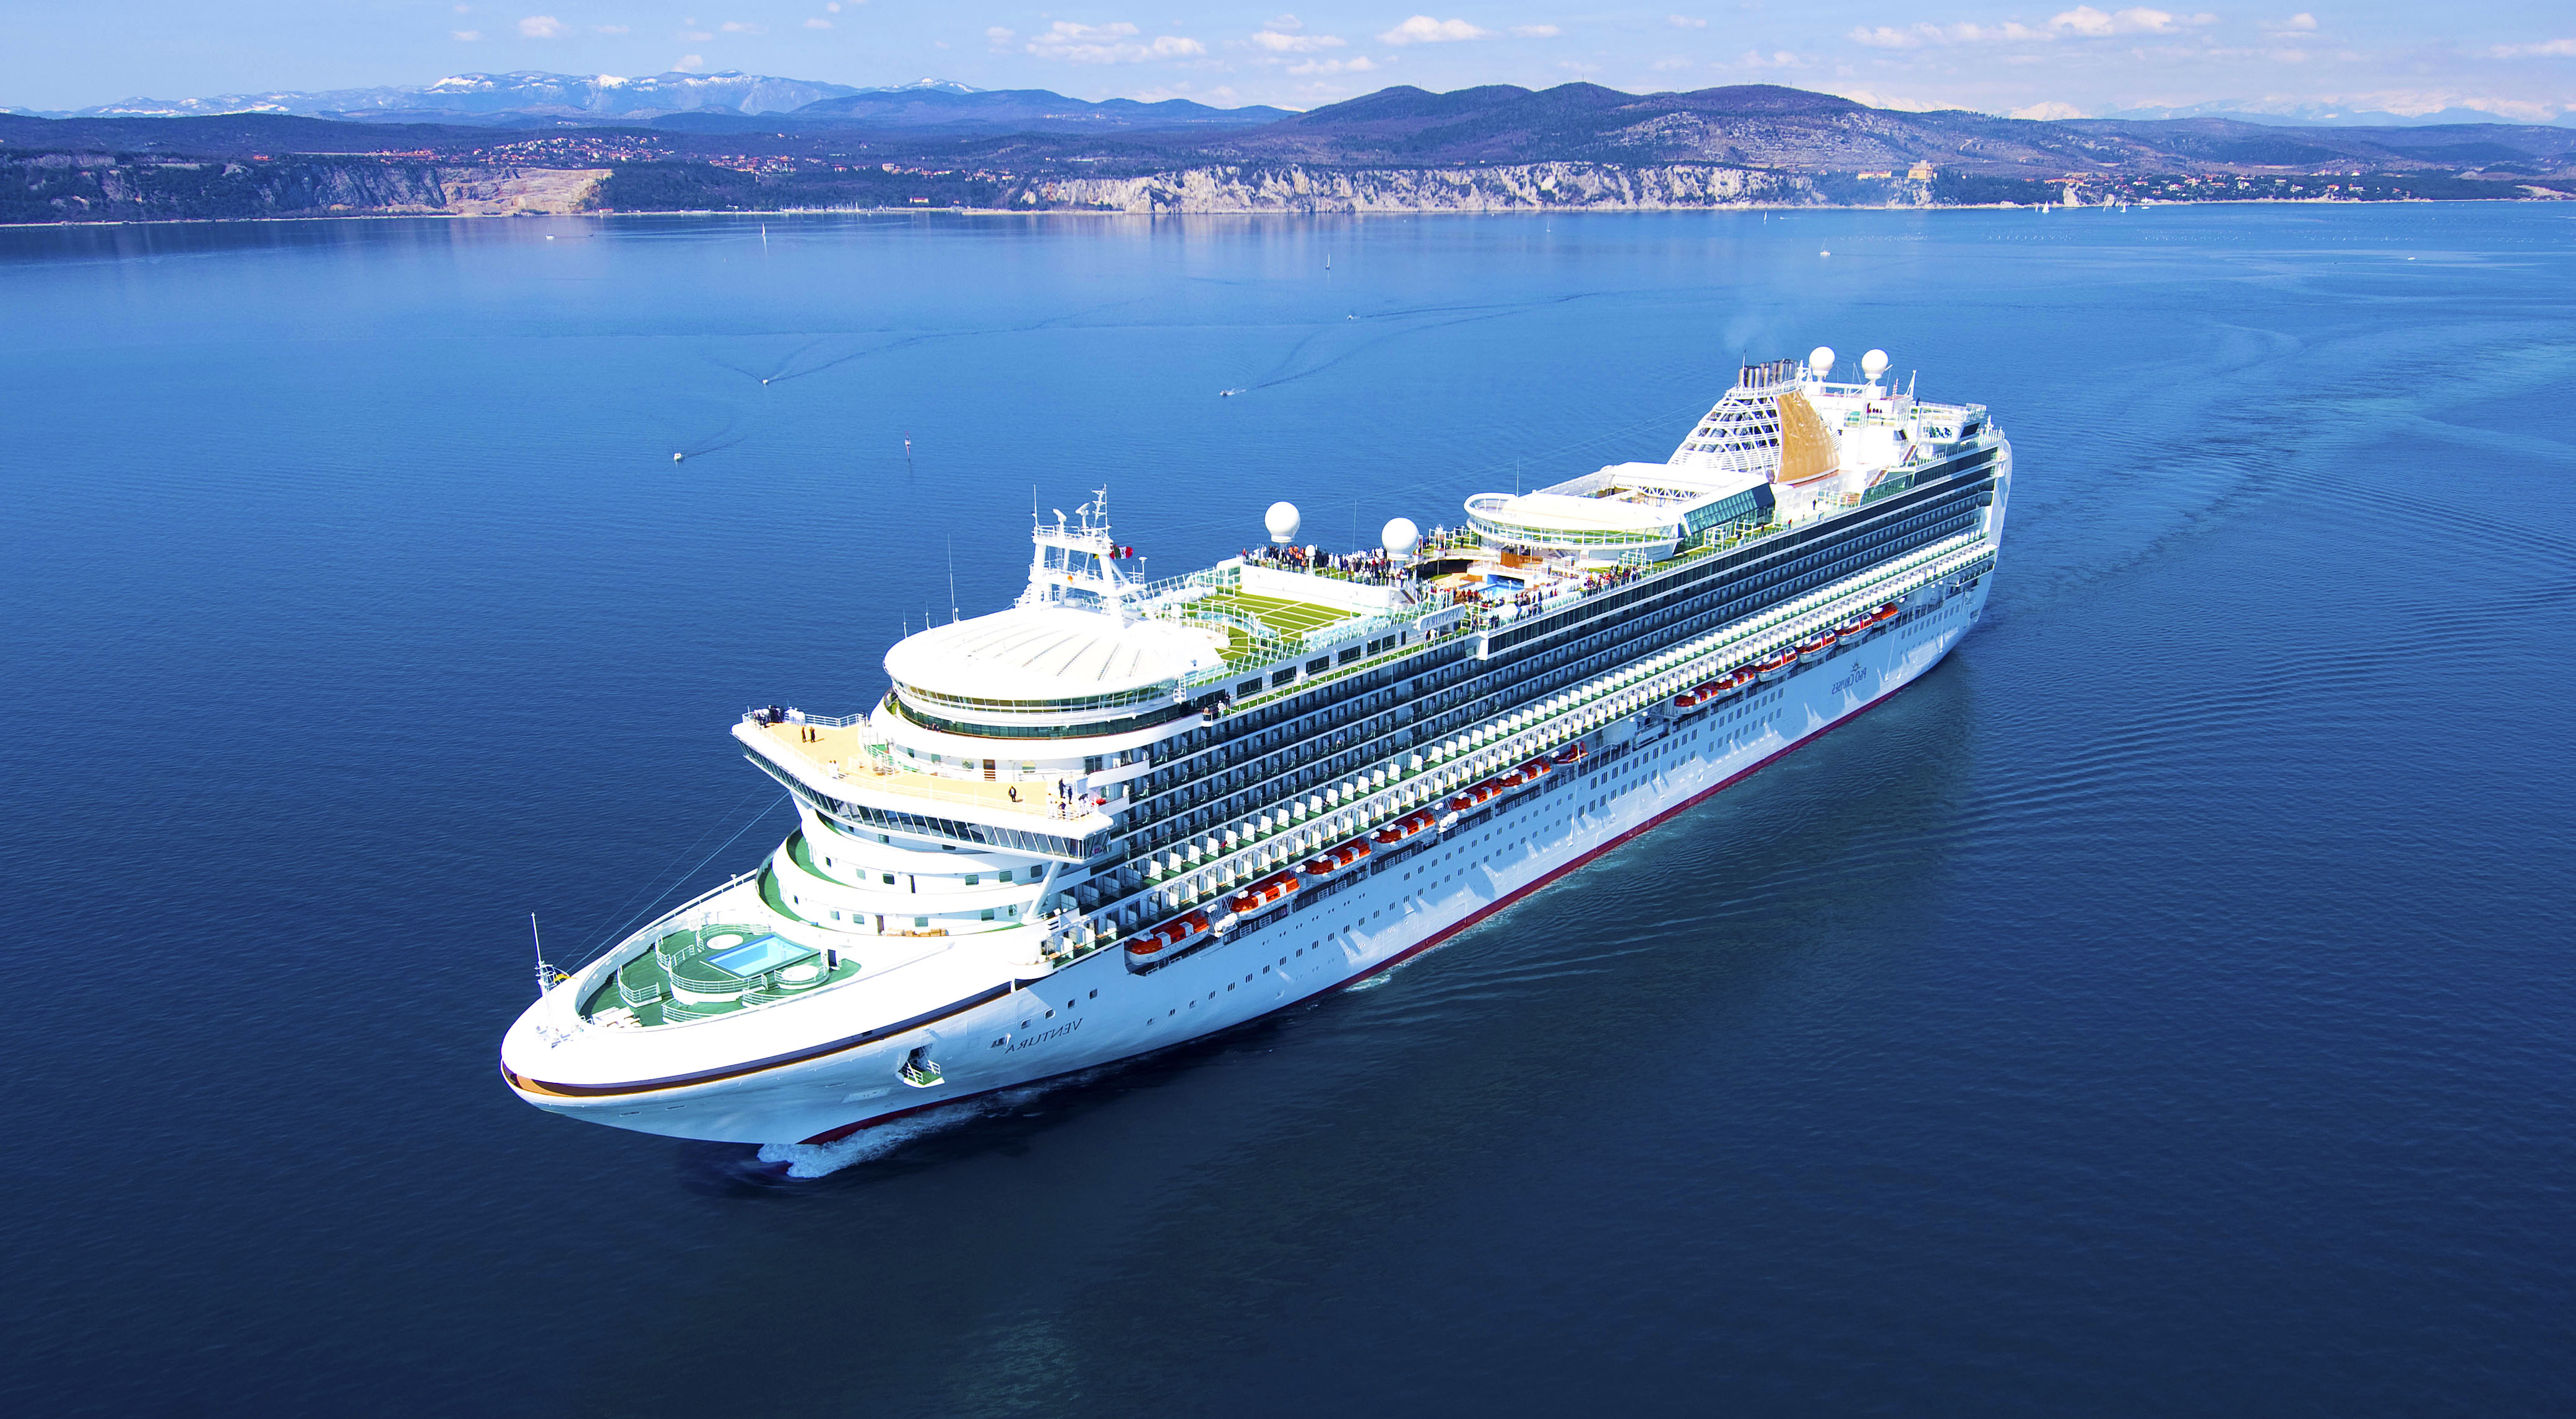 Ventura Cruise Ship Lisbon 2015 Lisbon Private